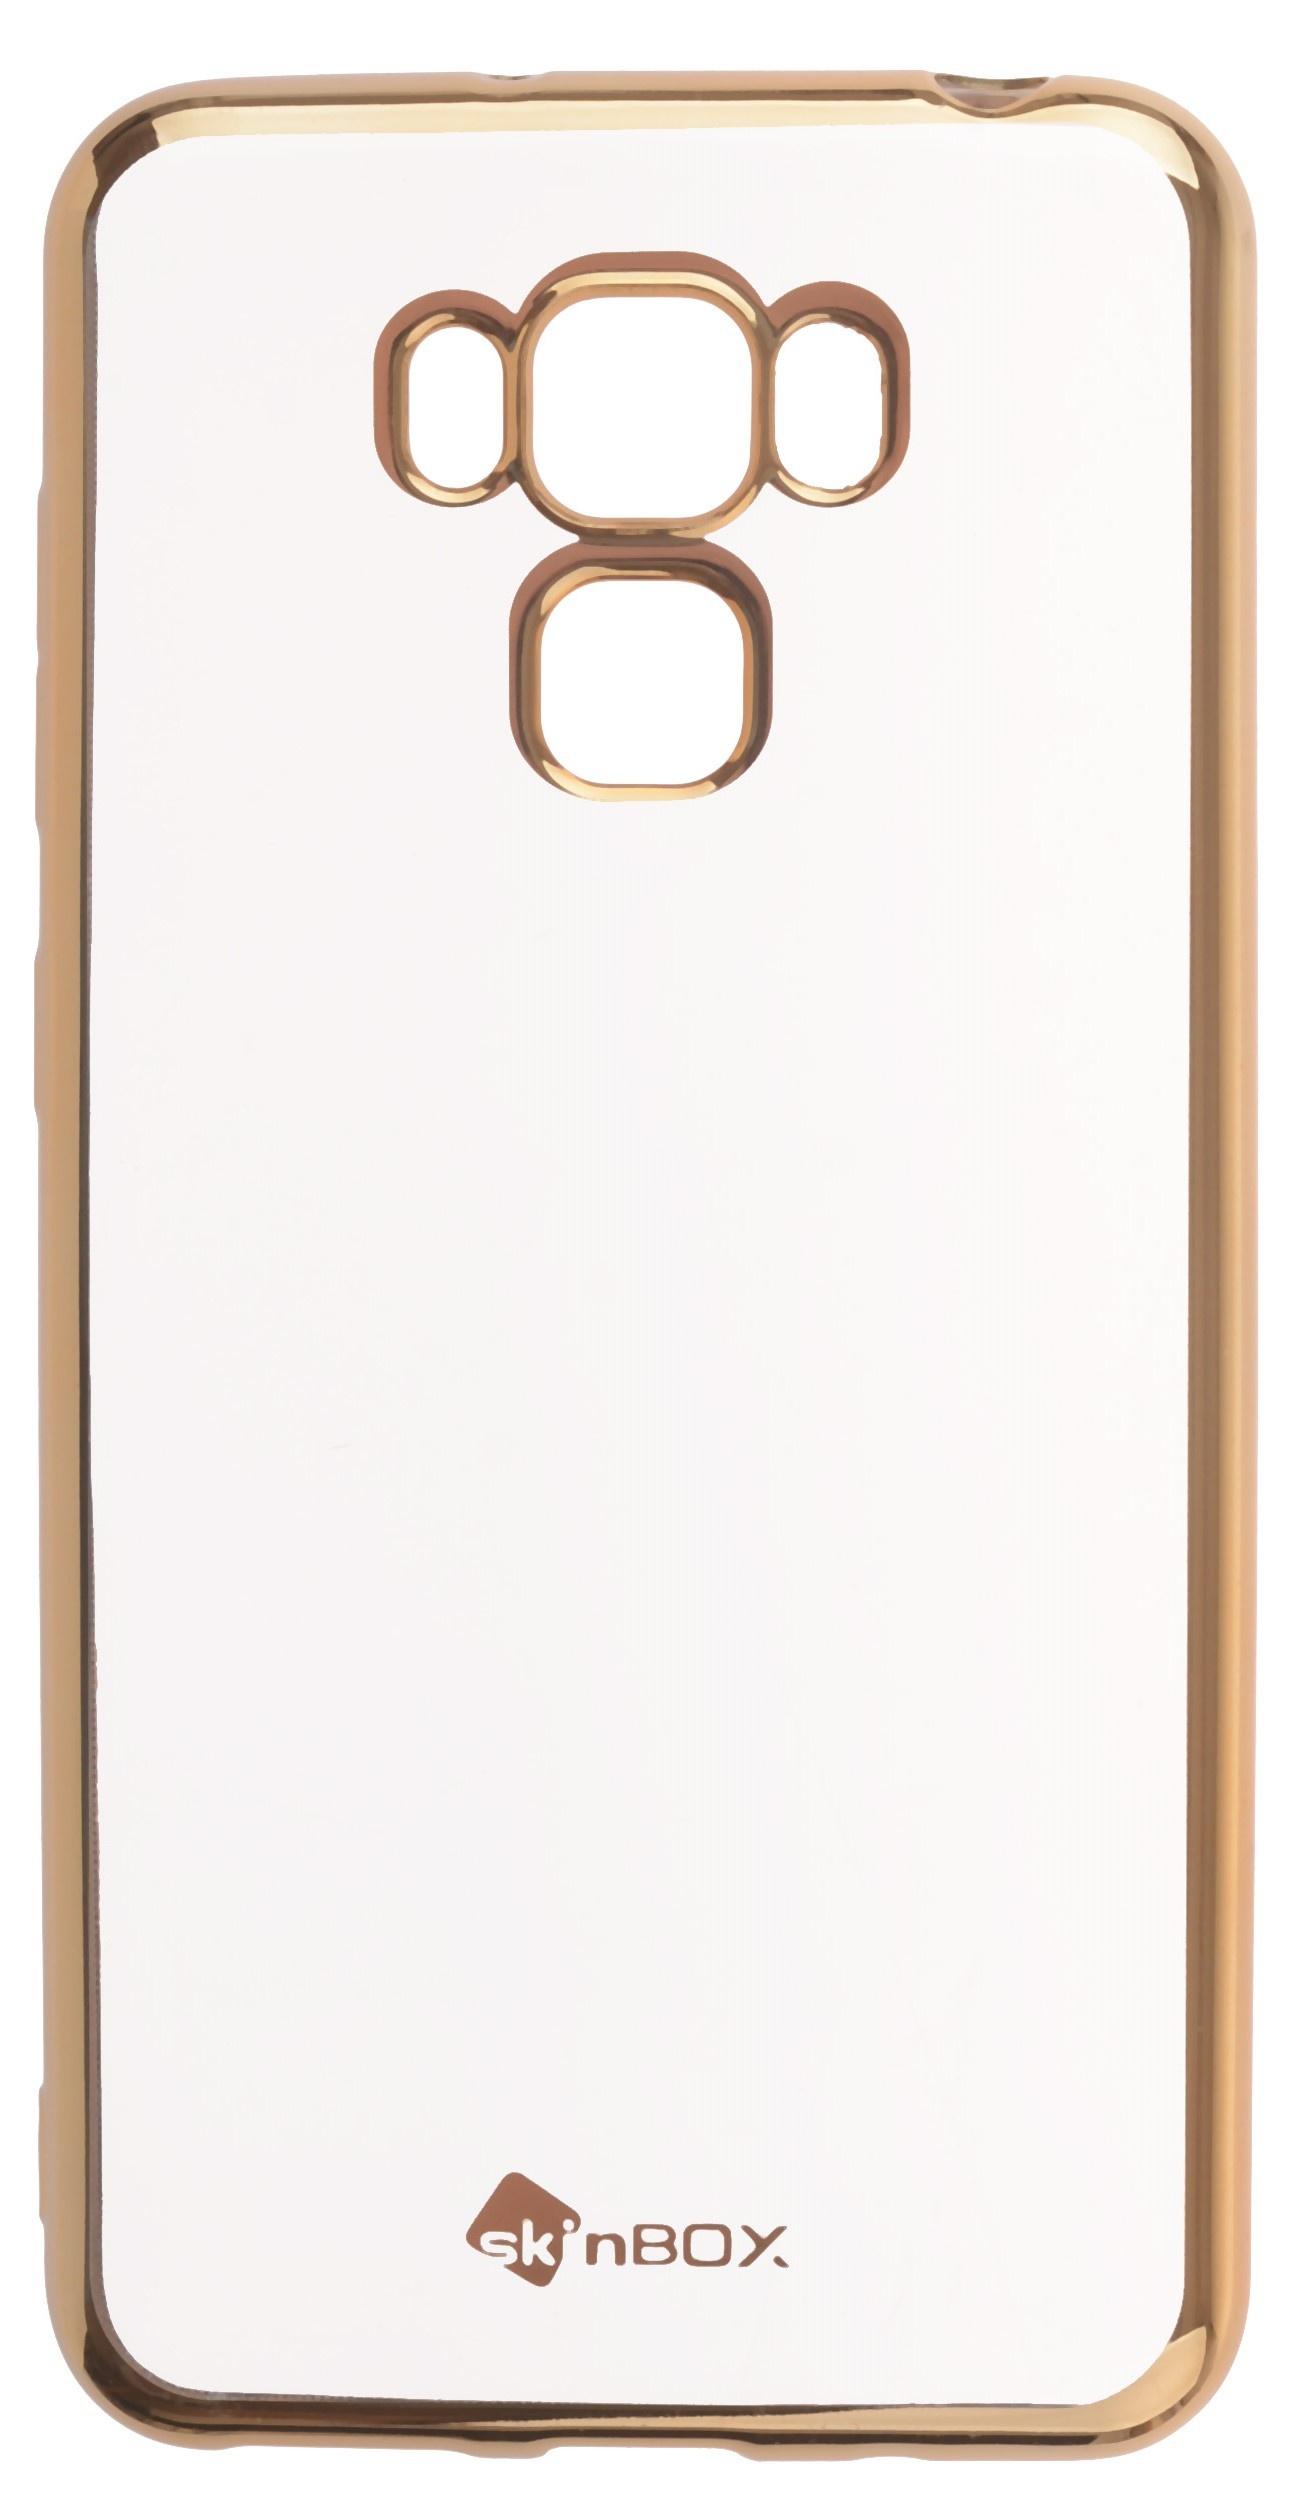 Чехол для сотового телефона skinBOX Silicone chrome border, 4660041408379, золотой skinbox silicone chrome border 4people чехол для xiaomi redmi 4 silver